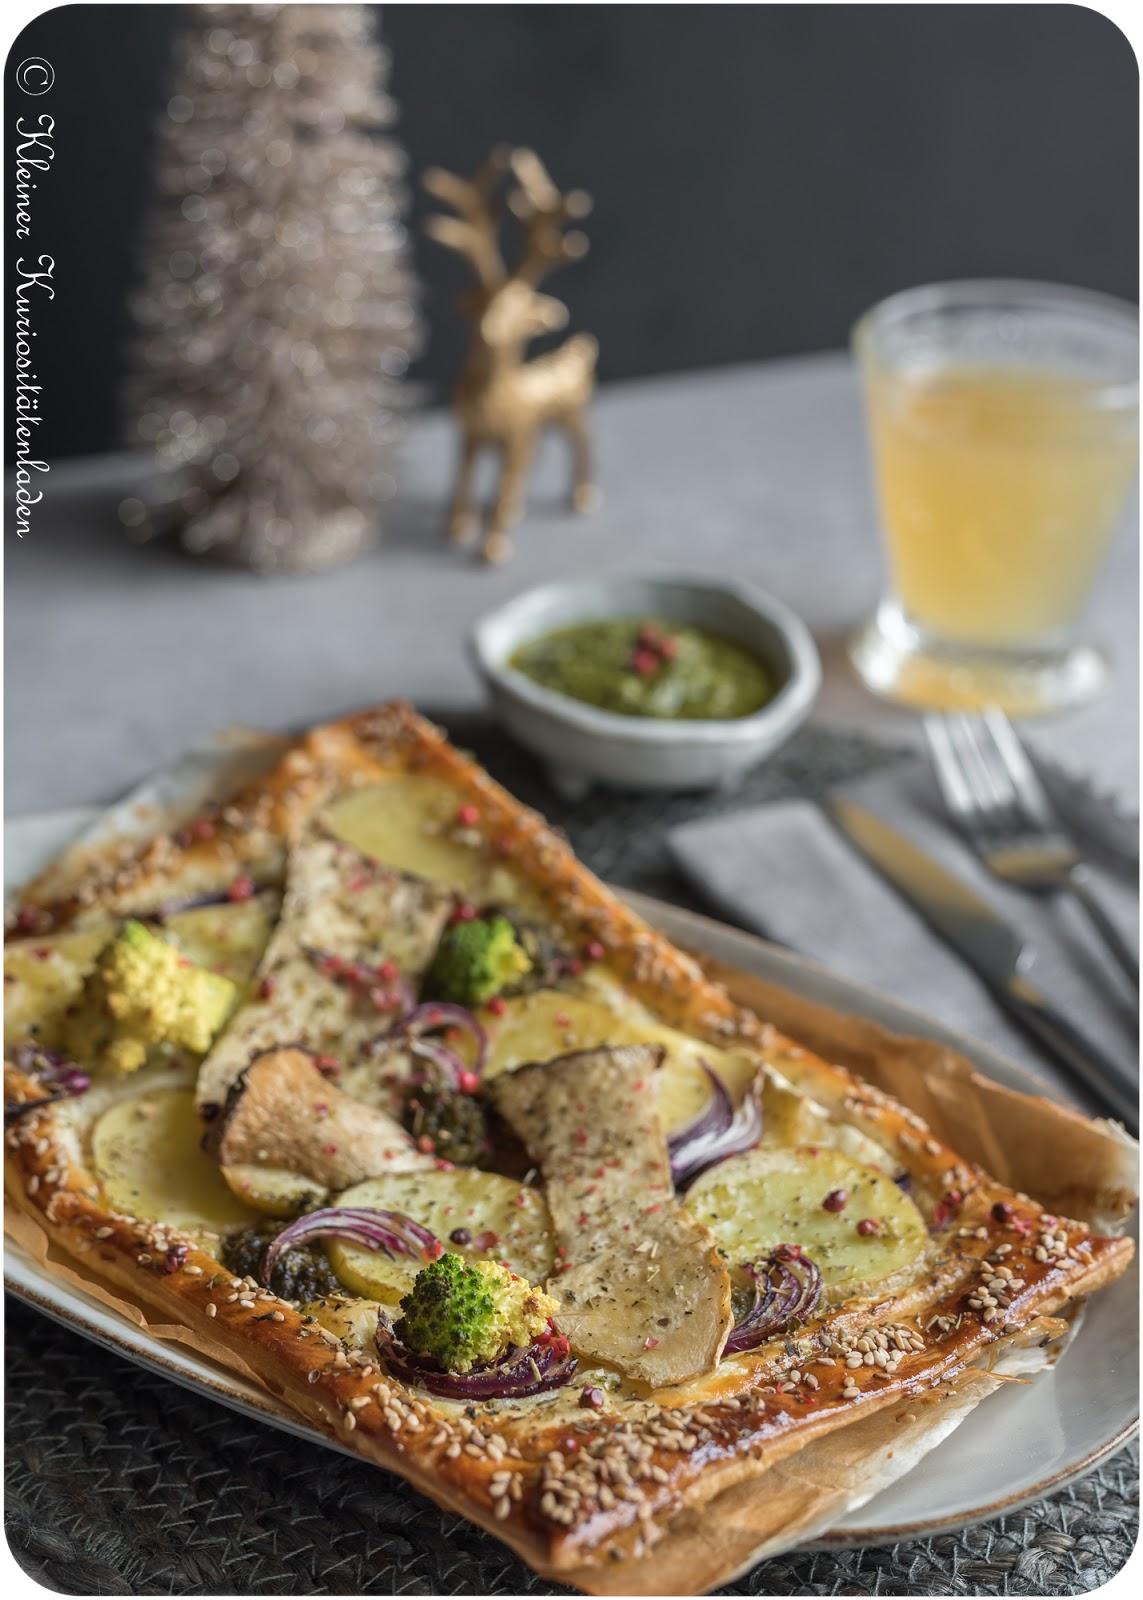 Kartoffel-Pilz-Tartes mit Feldsalatpesto